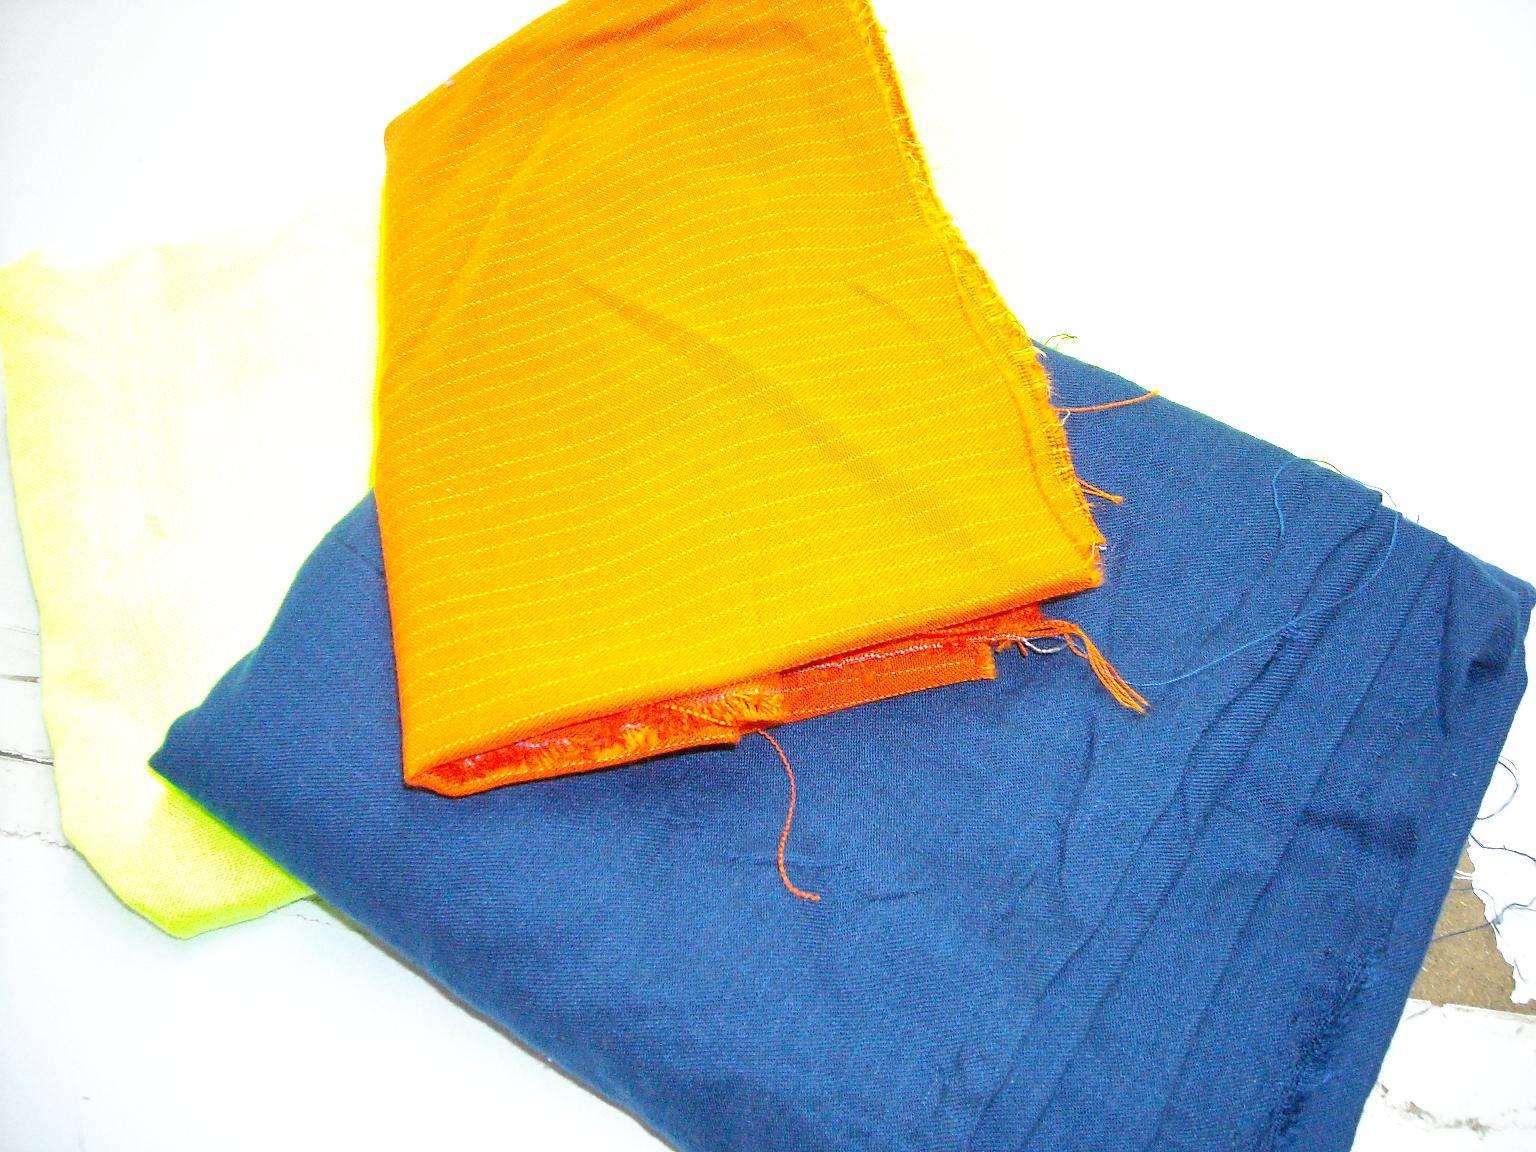 flame retardant modacrylic fabric